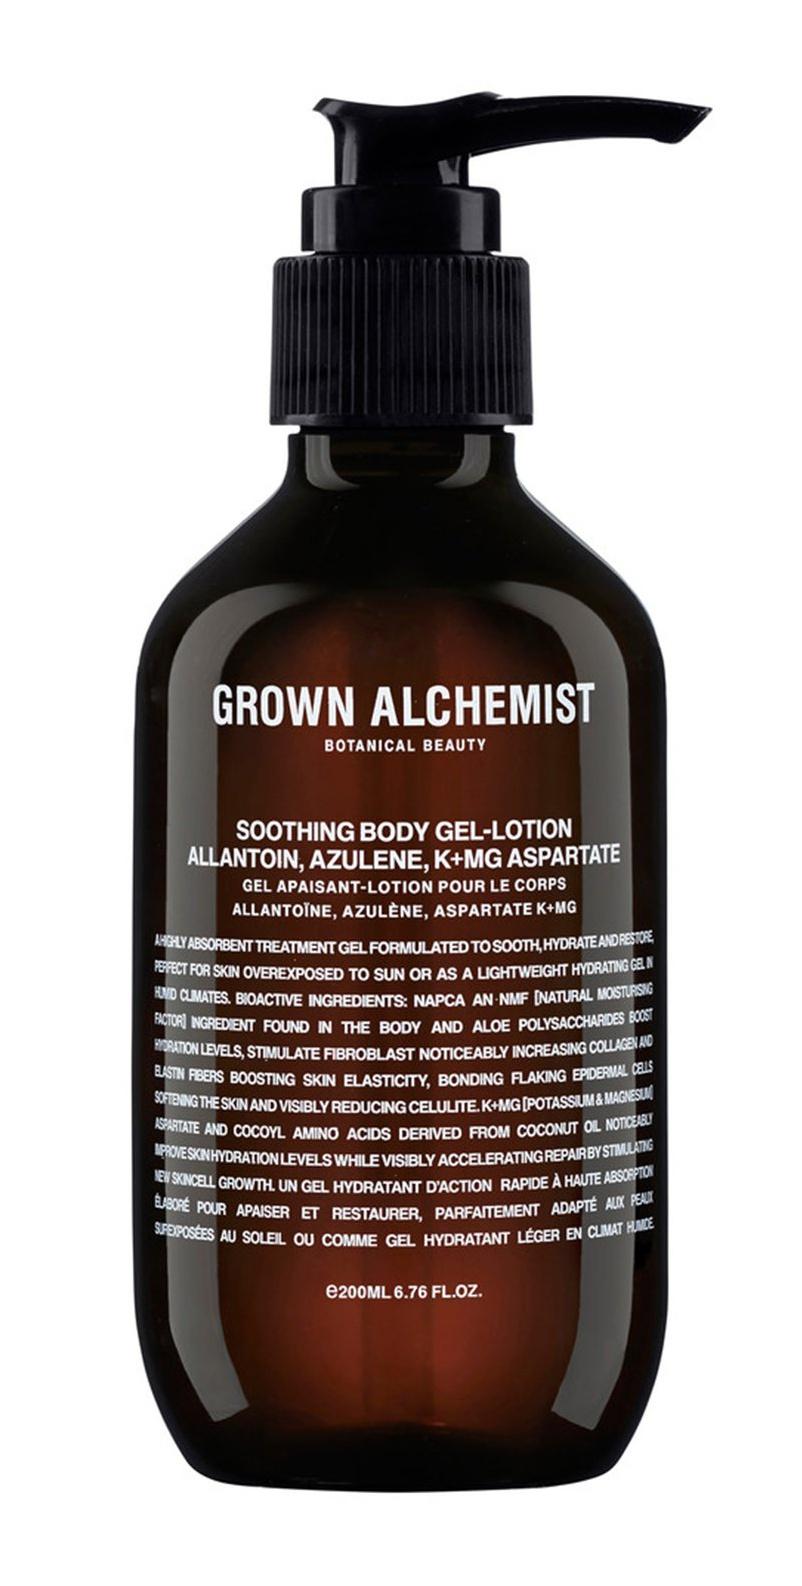 Grown Alchemist Soothing Body Gel-Lotion - Allantoin, Azulene, K+Mg Aspartate